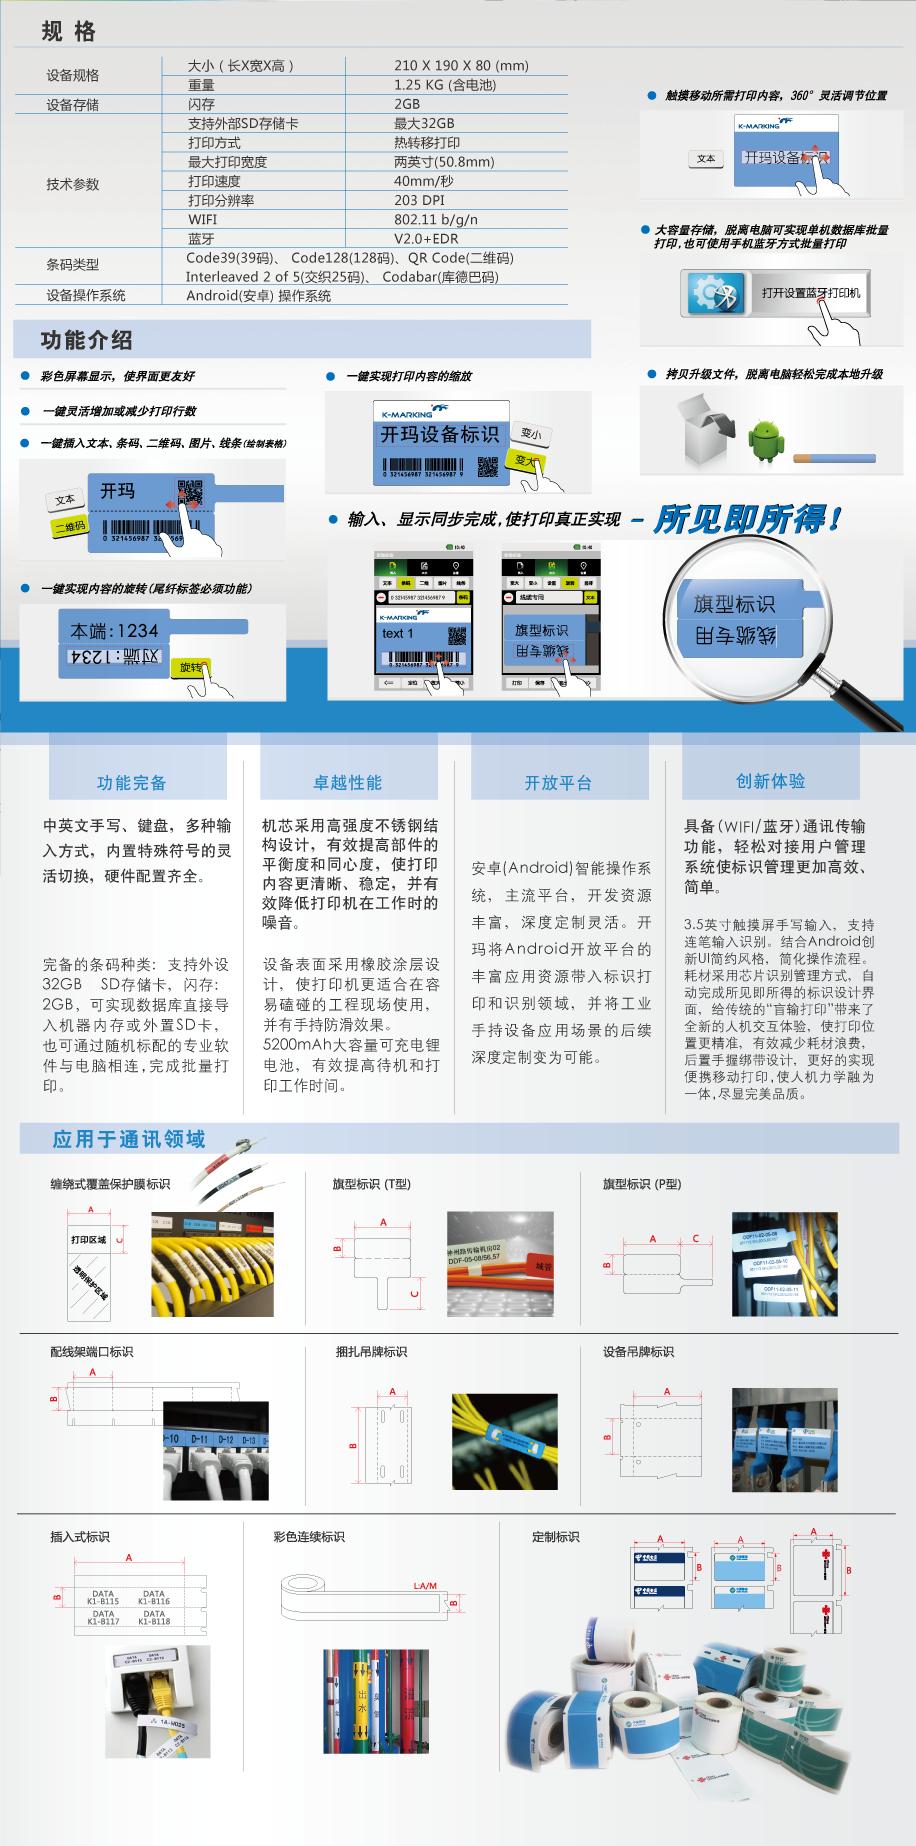 设备系列-KP50-02.png